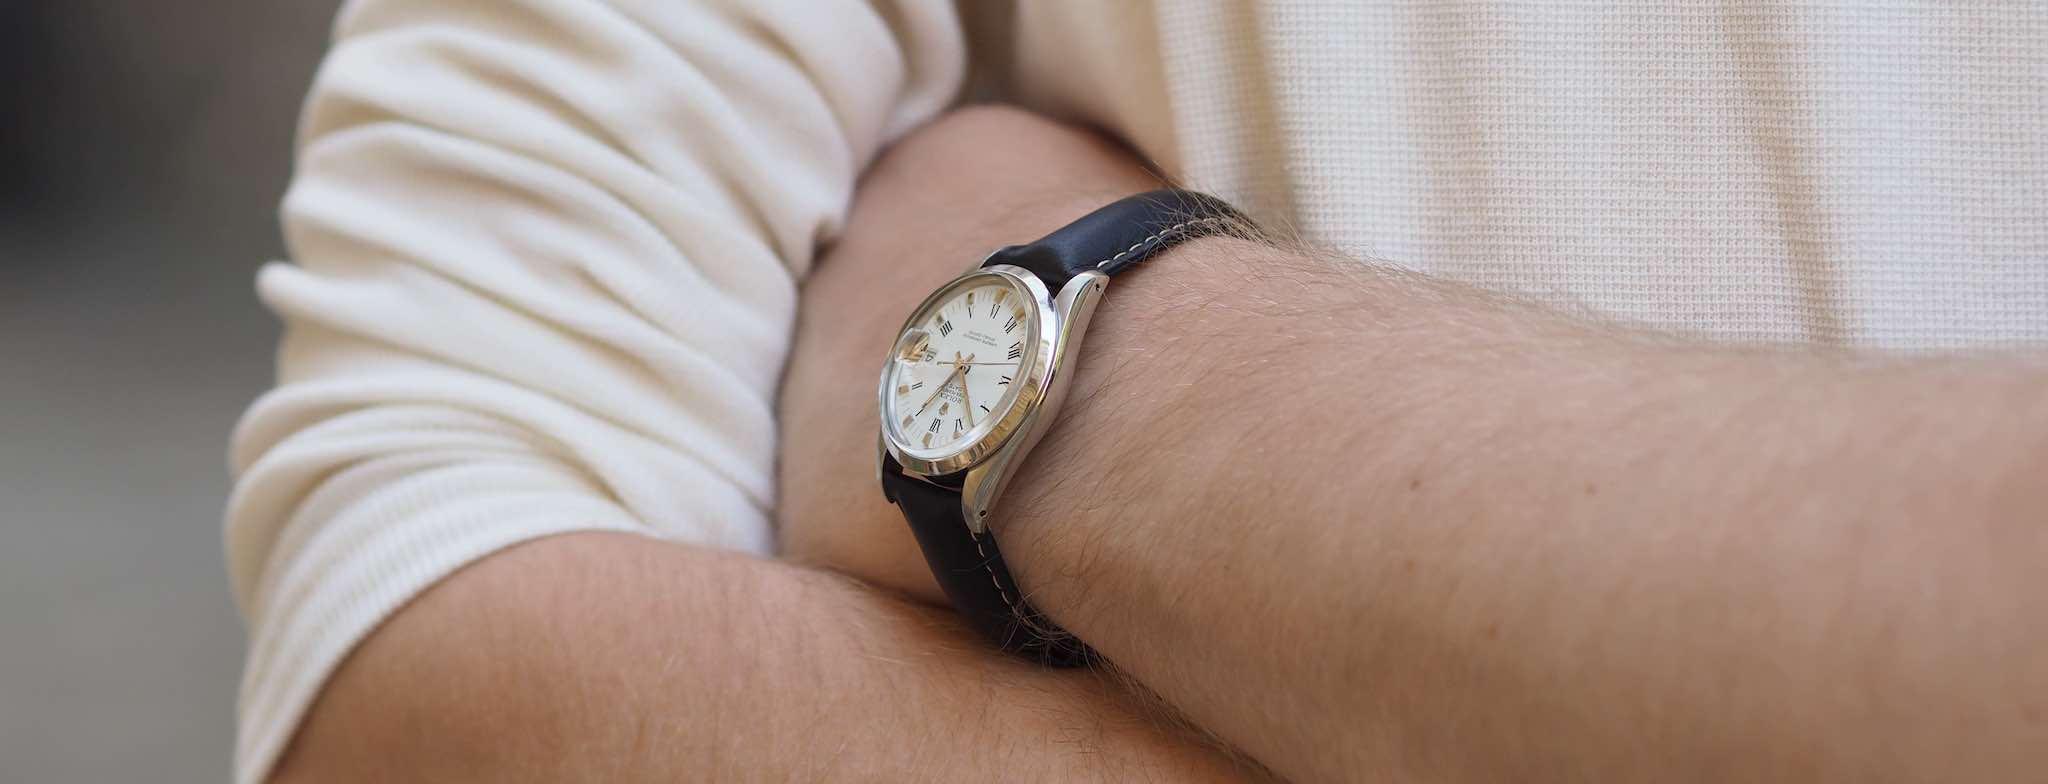 montres anciennes homme